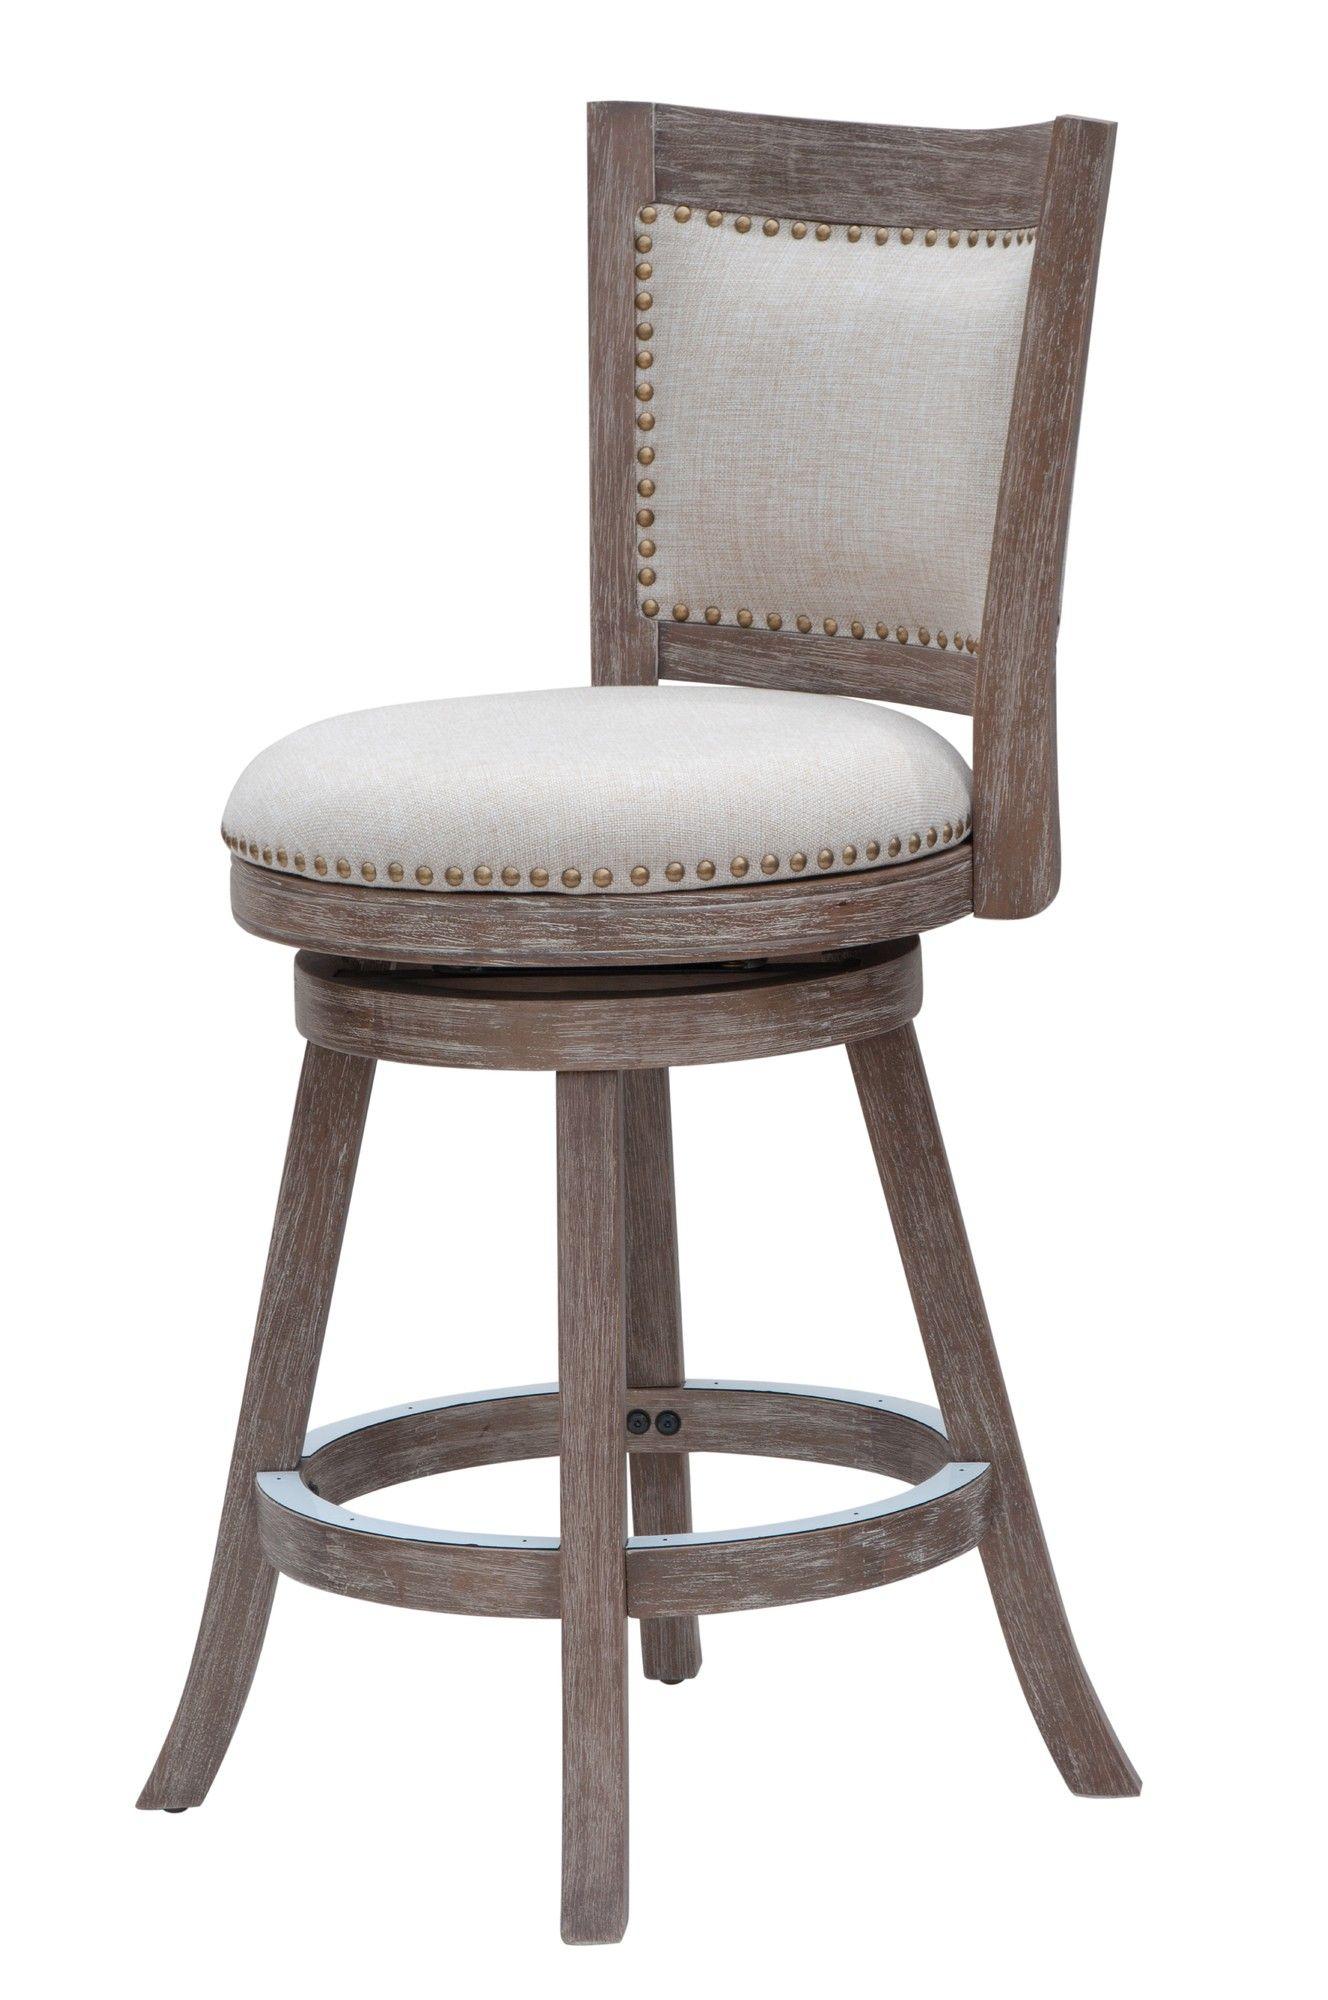 i like the details on the bar stool boraam melrose 24 swivel bar stool reviews wayfair 154 99